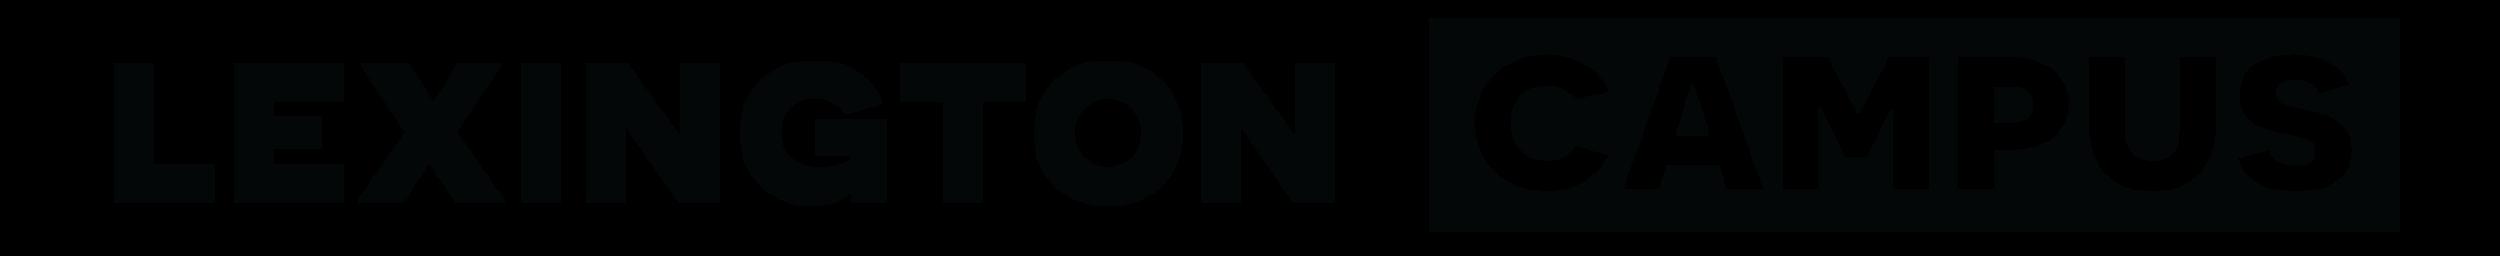 Lexington Logo black bar.png